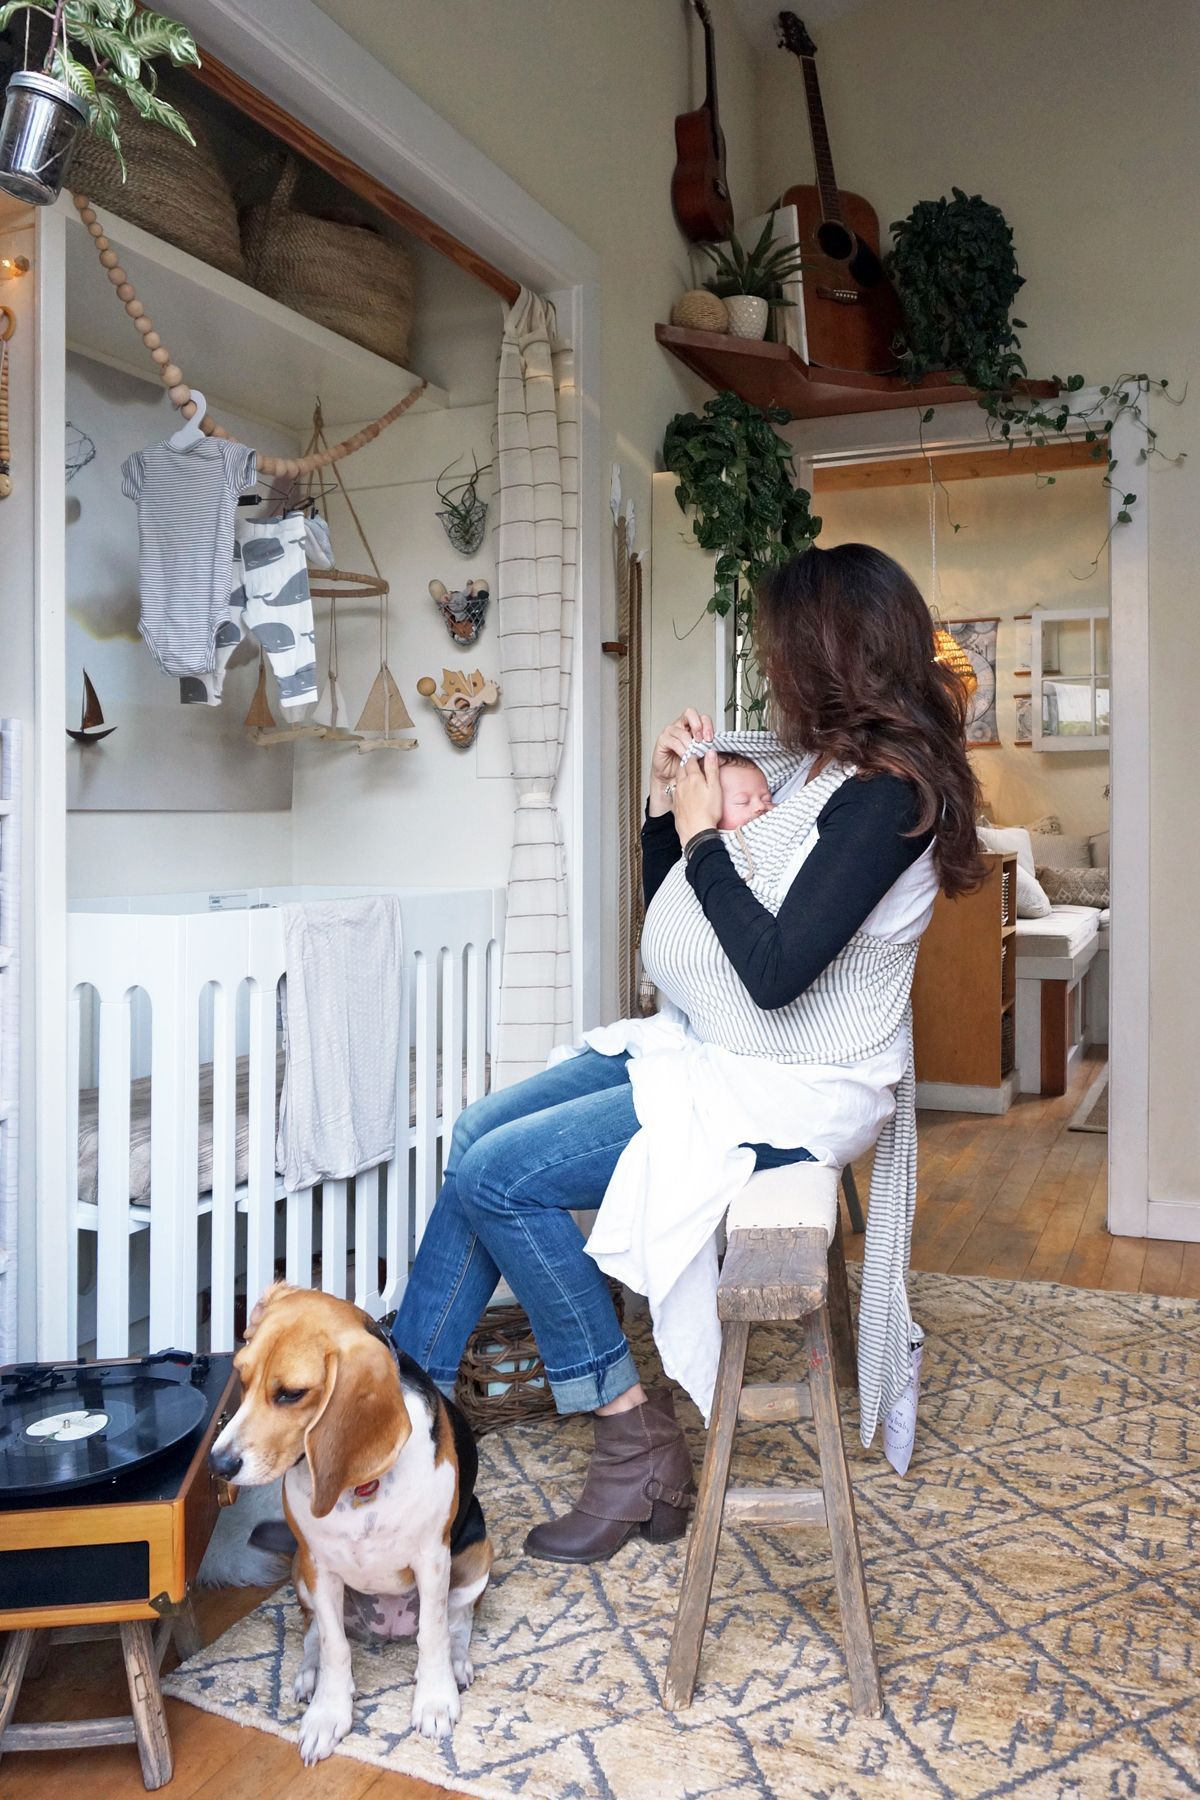 Best 25+ Mini Crib Ideas On Pinterest  Small Space Nursery, Apartment  Nursery And Small Baby Cribs